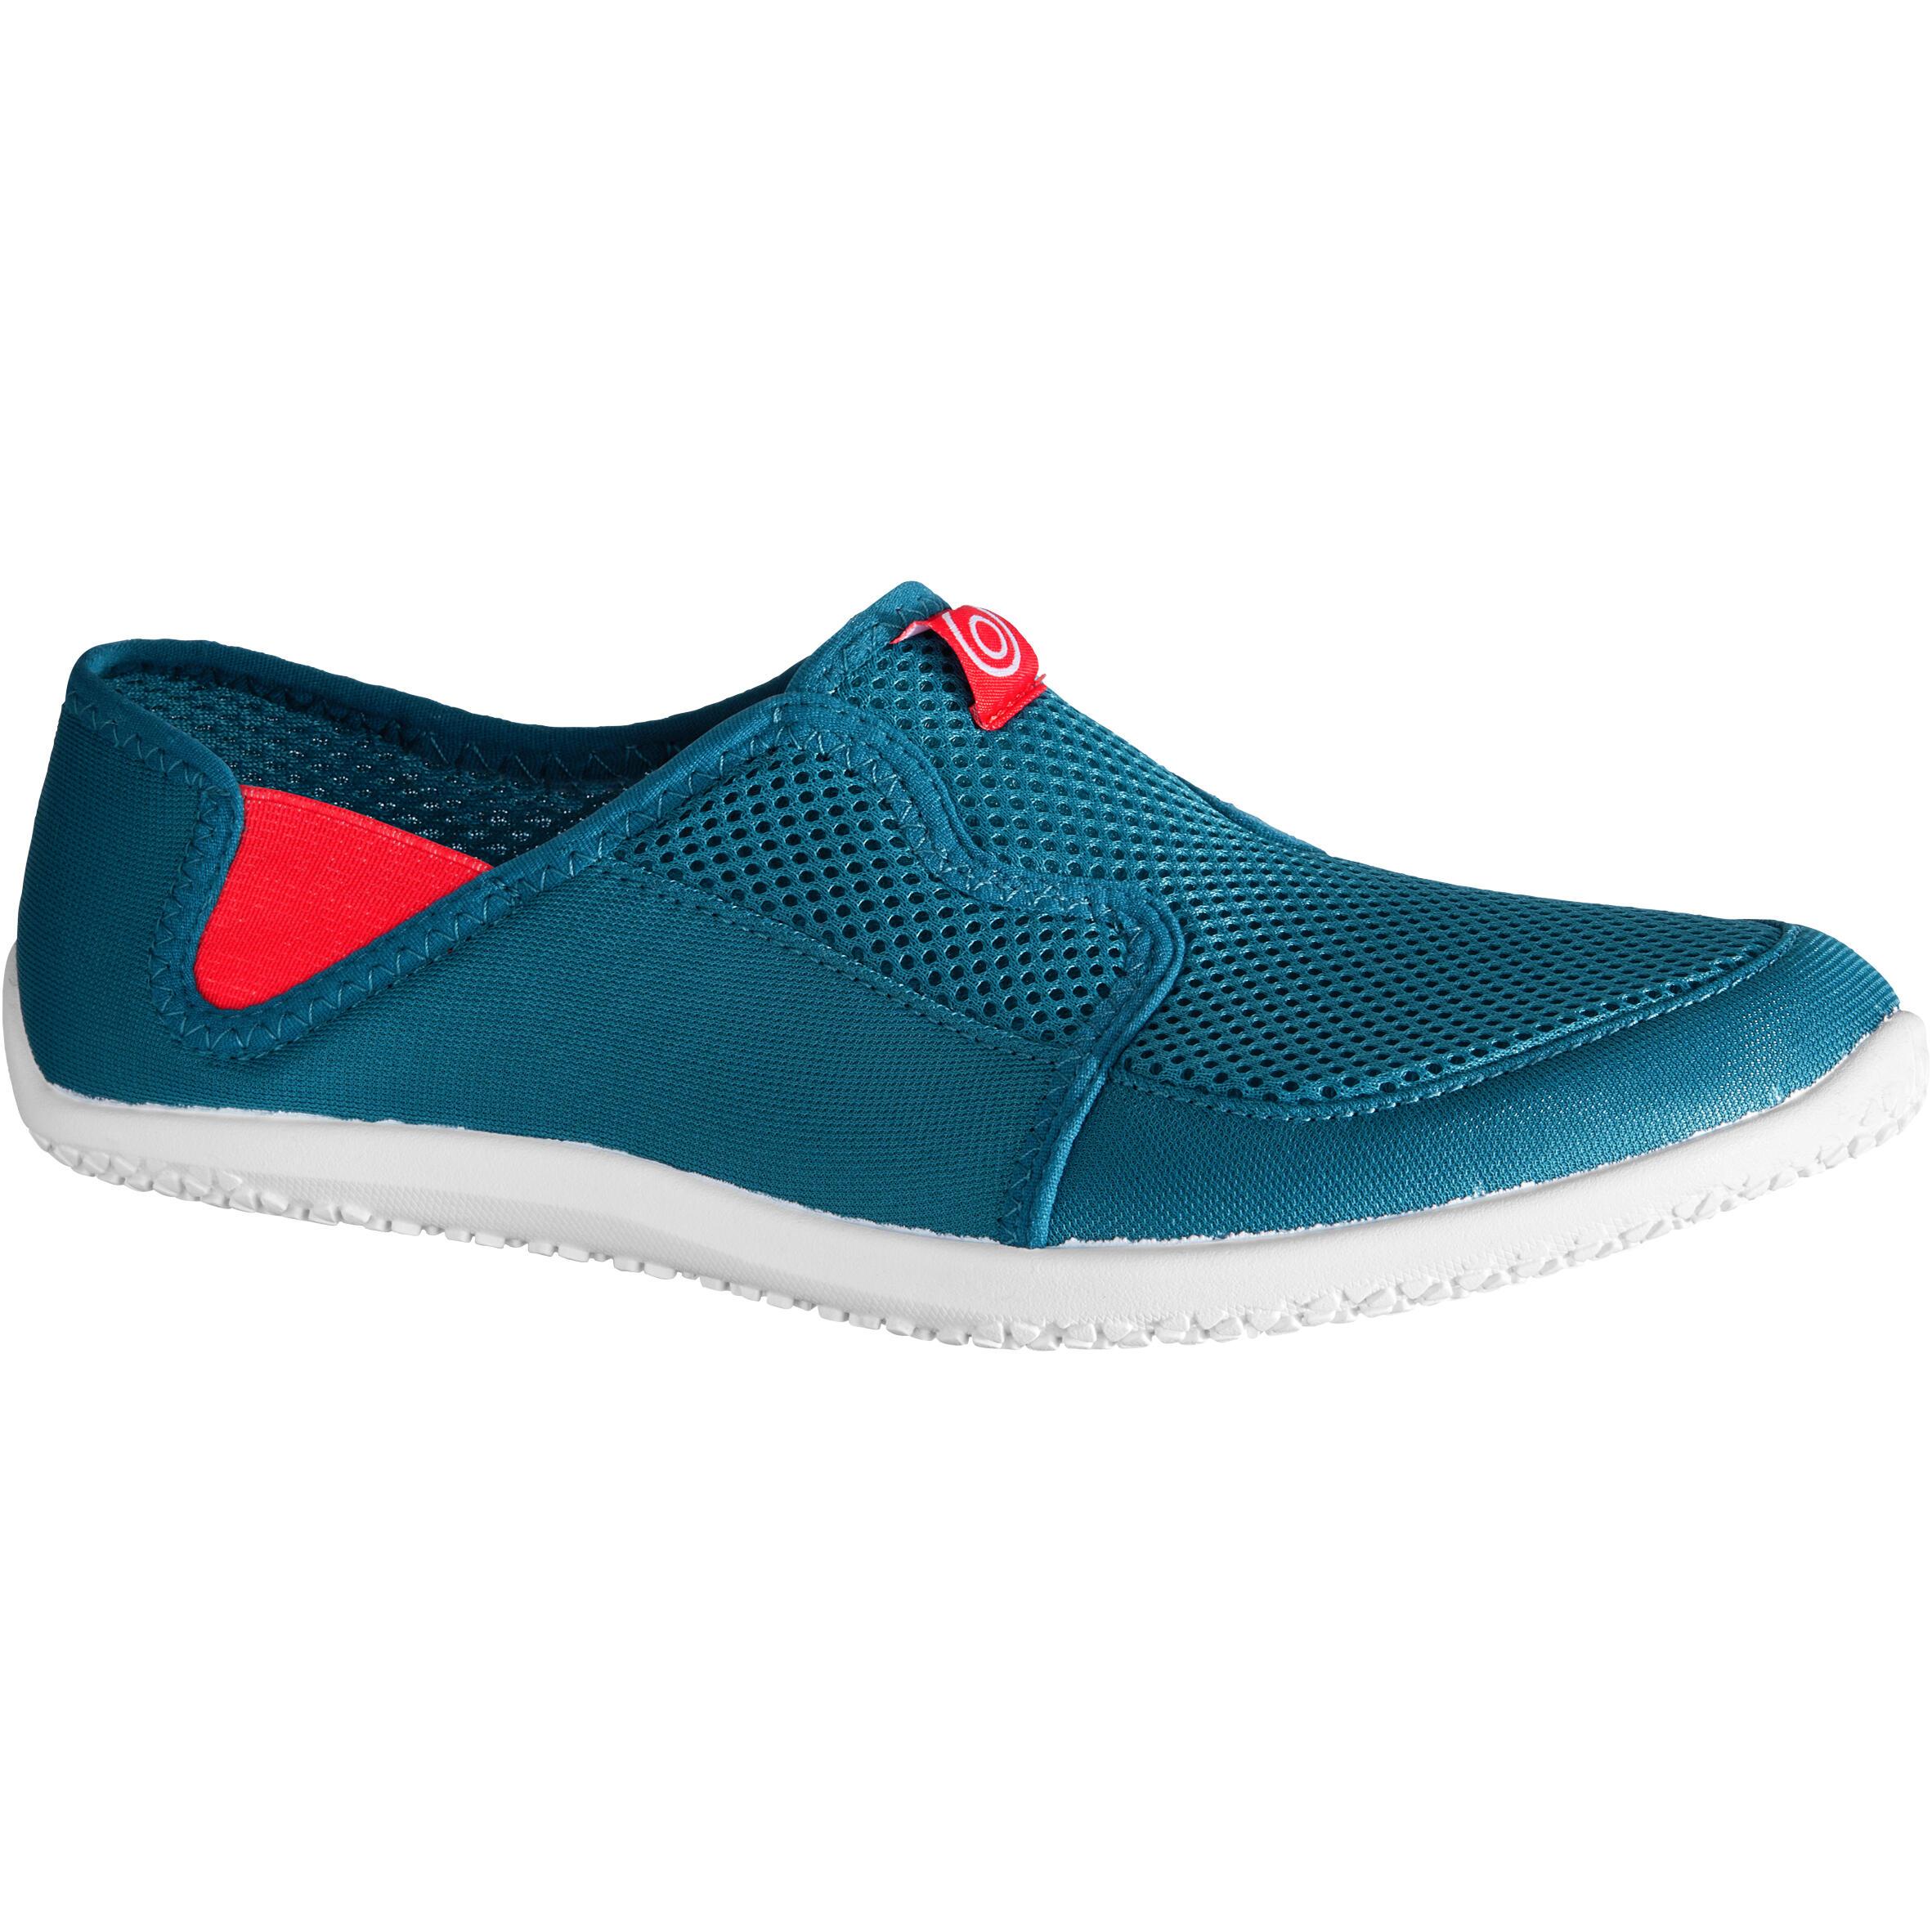 Aquashoes chaussures aquatiques 120 adulte bleu rouge - Subea